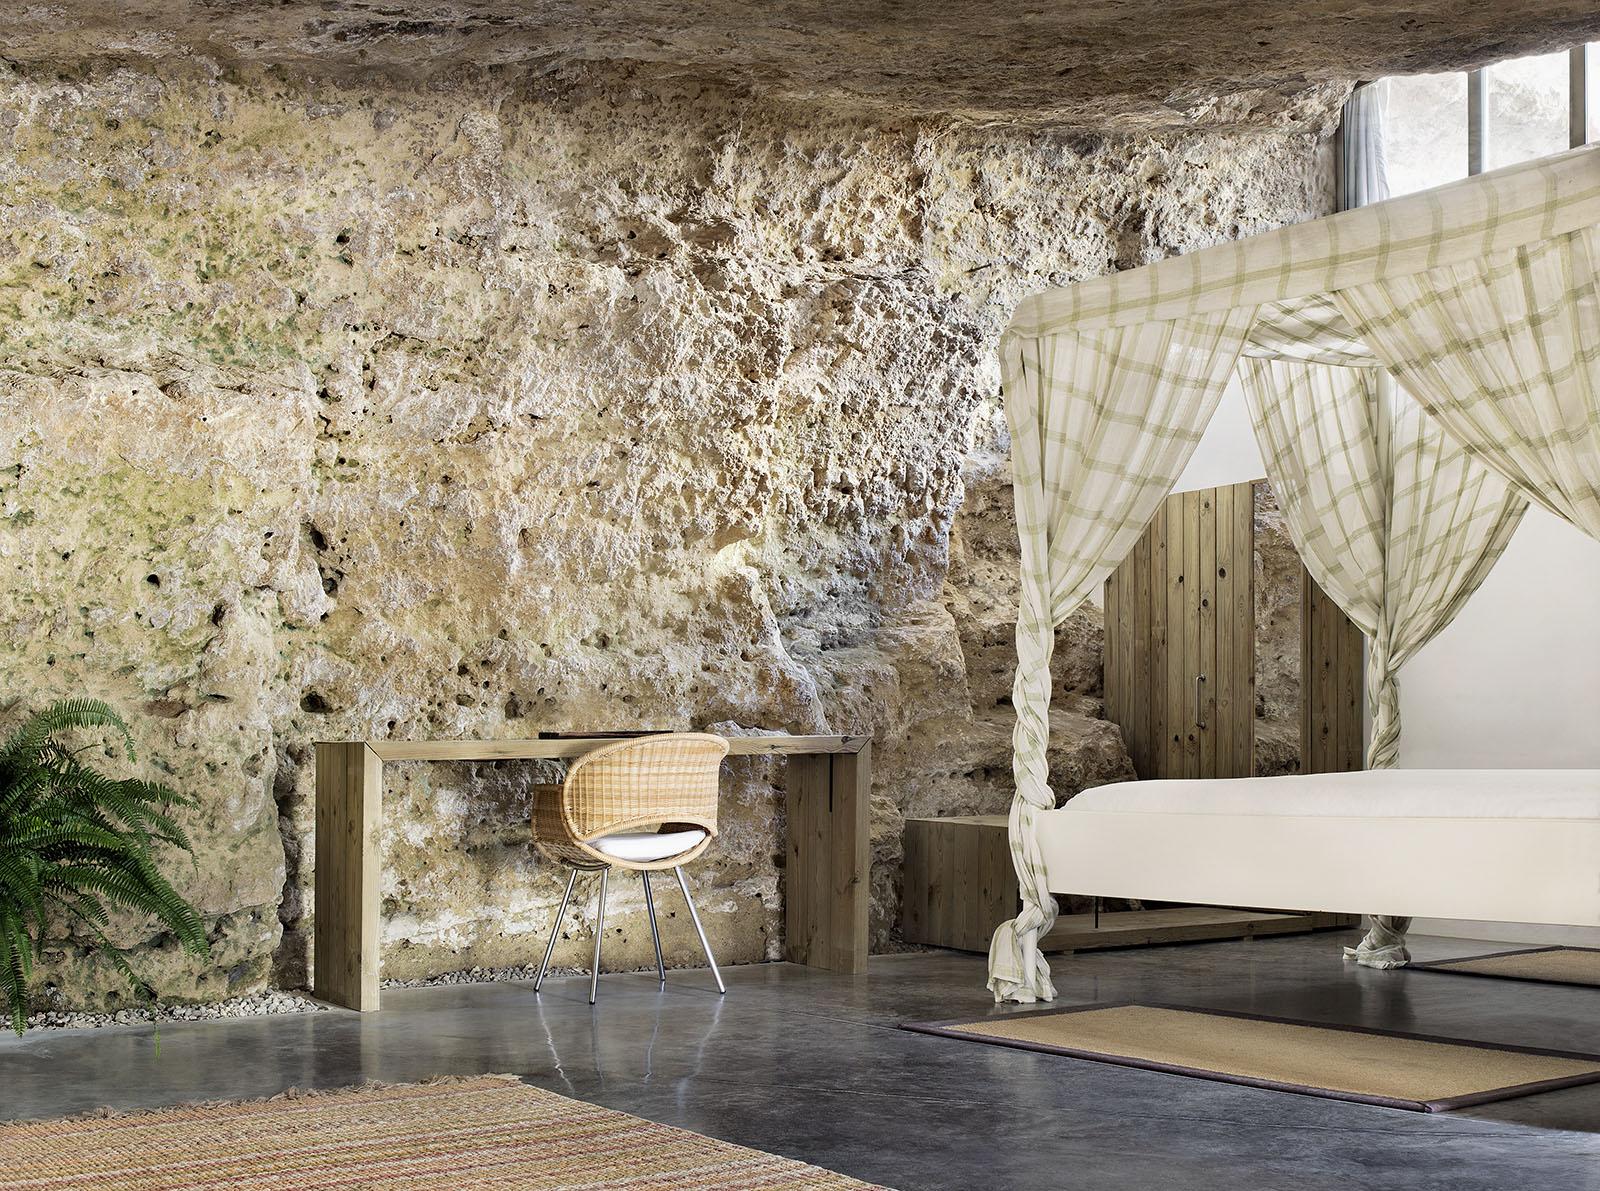 8. Cave House in Villarrubia Córdoba - Casa Tierra: a Cave House in Córdoba by UMMO Estudio